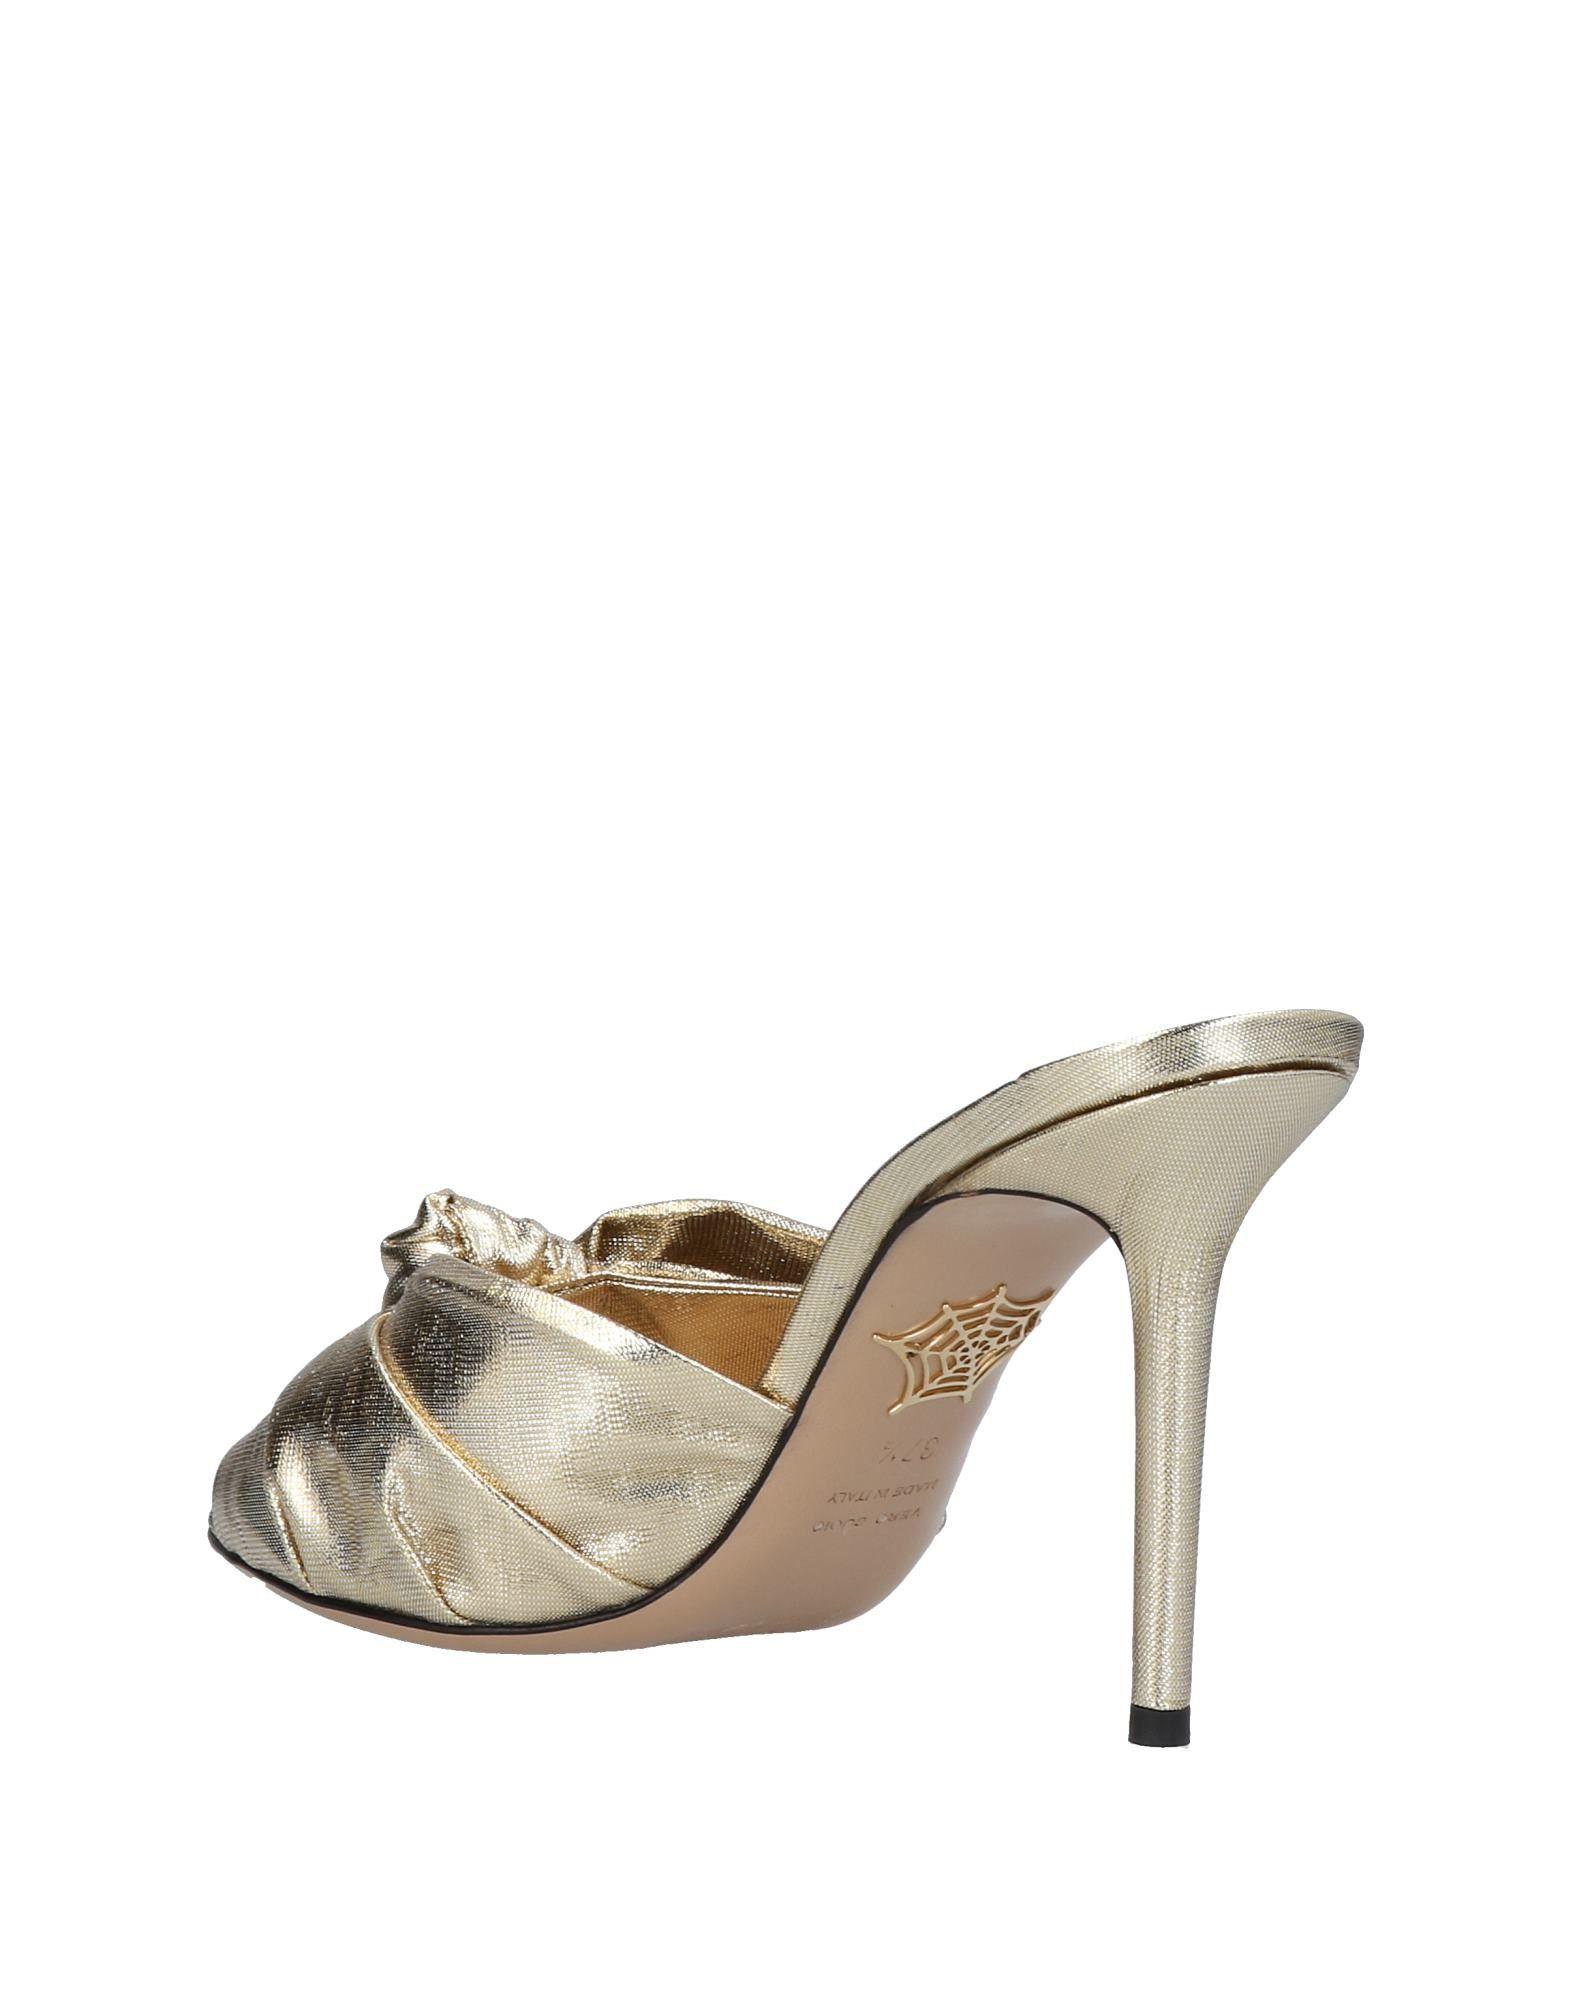 Charlotte Damen Olympia Sandalen Damen Charlotte  11430164HL Beliebte Schuhe eec250